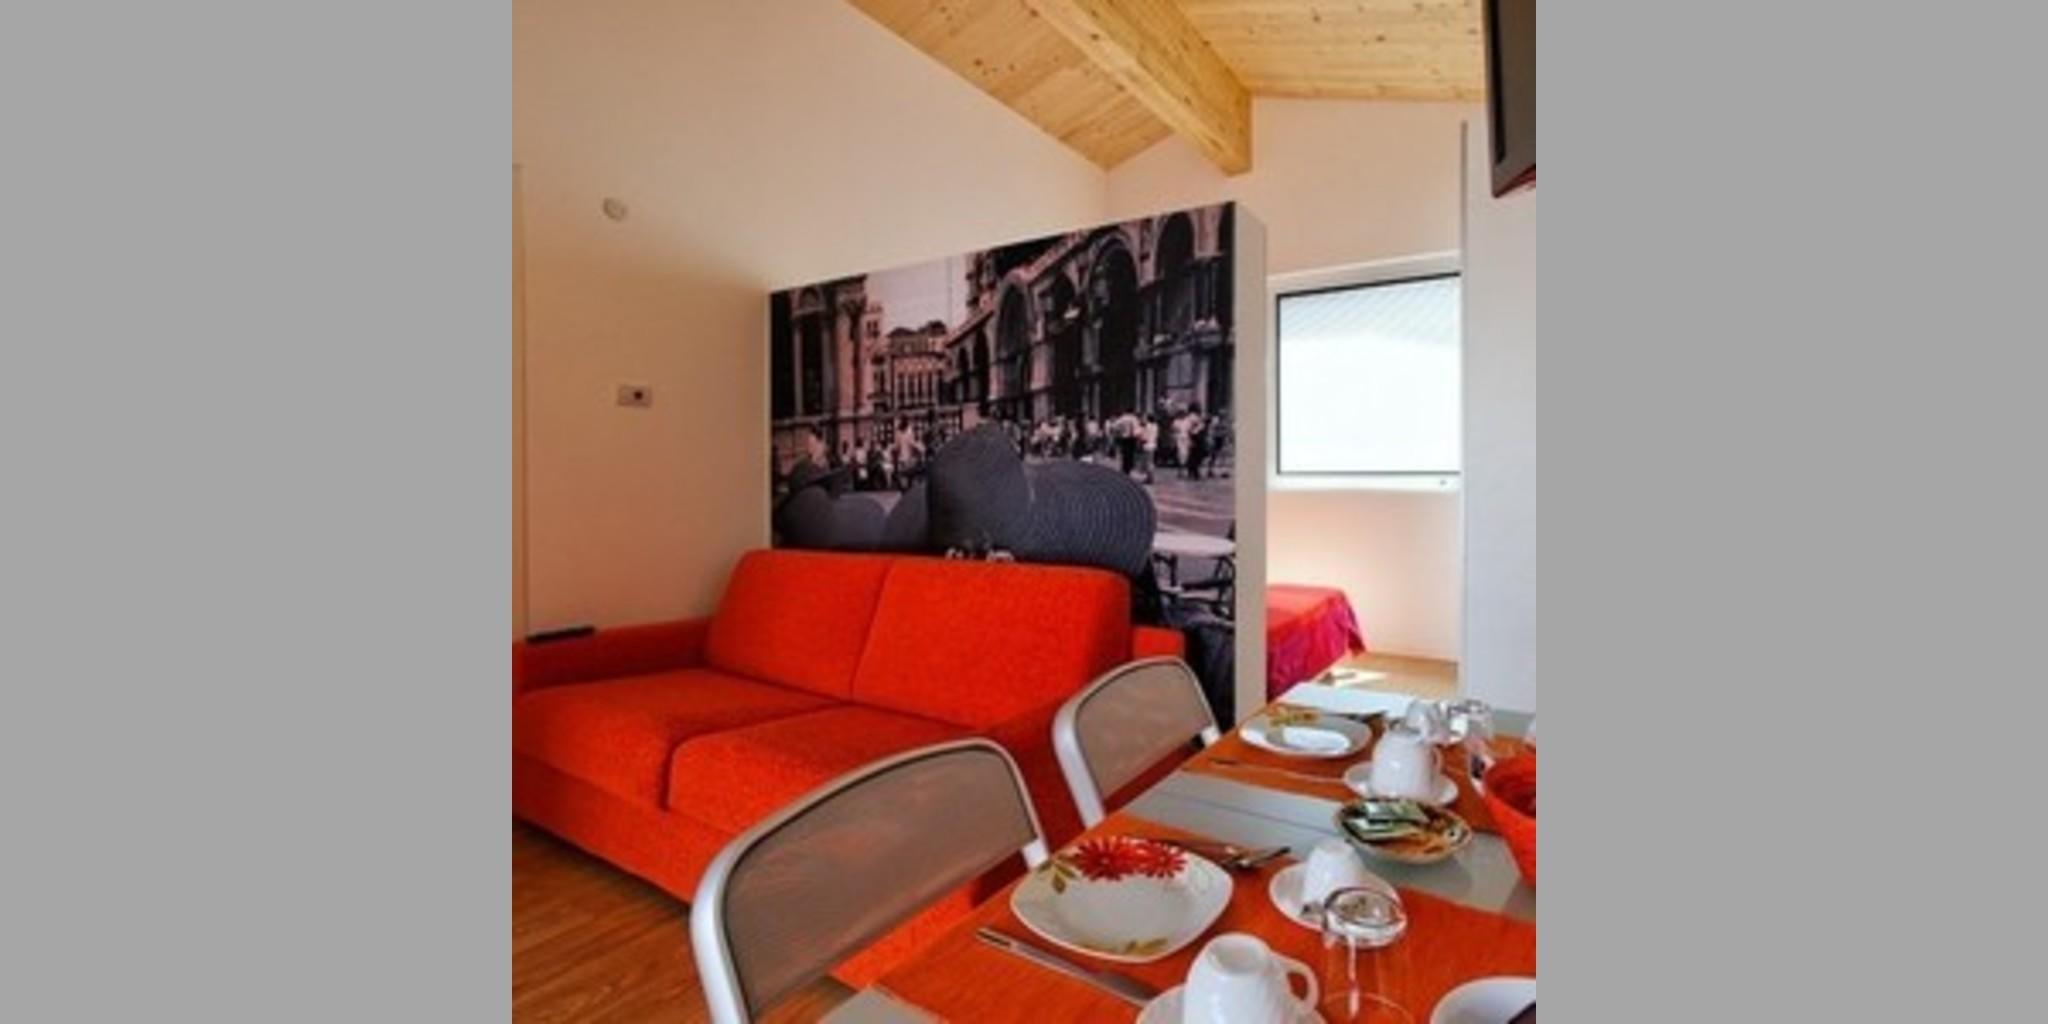 Appartement Venezia - Venezia_Favaro Veneto